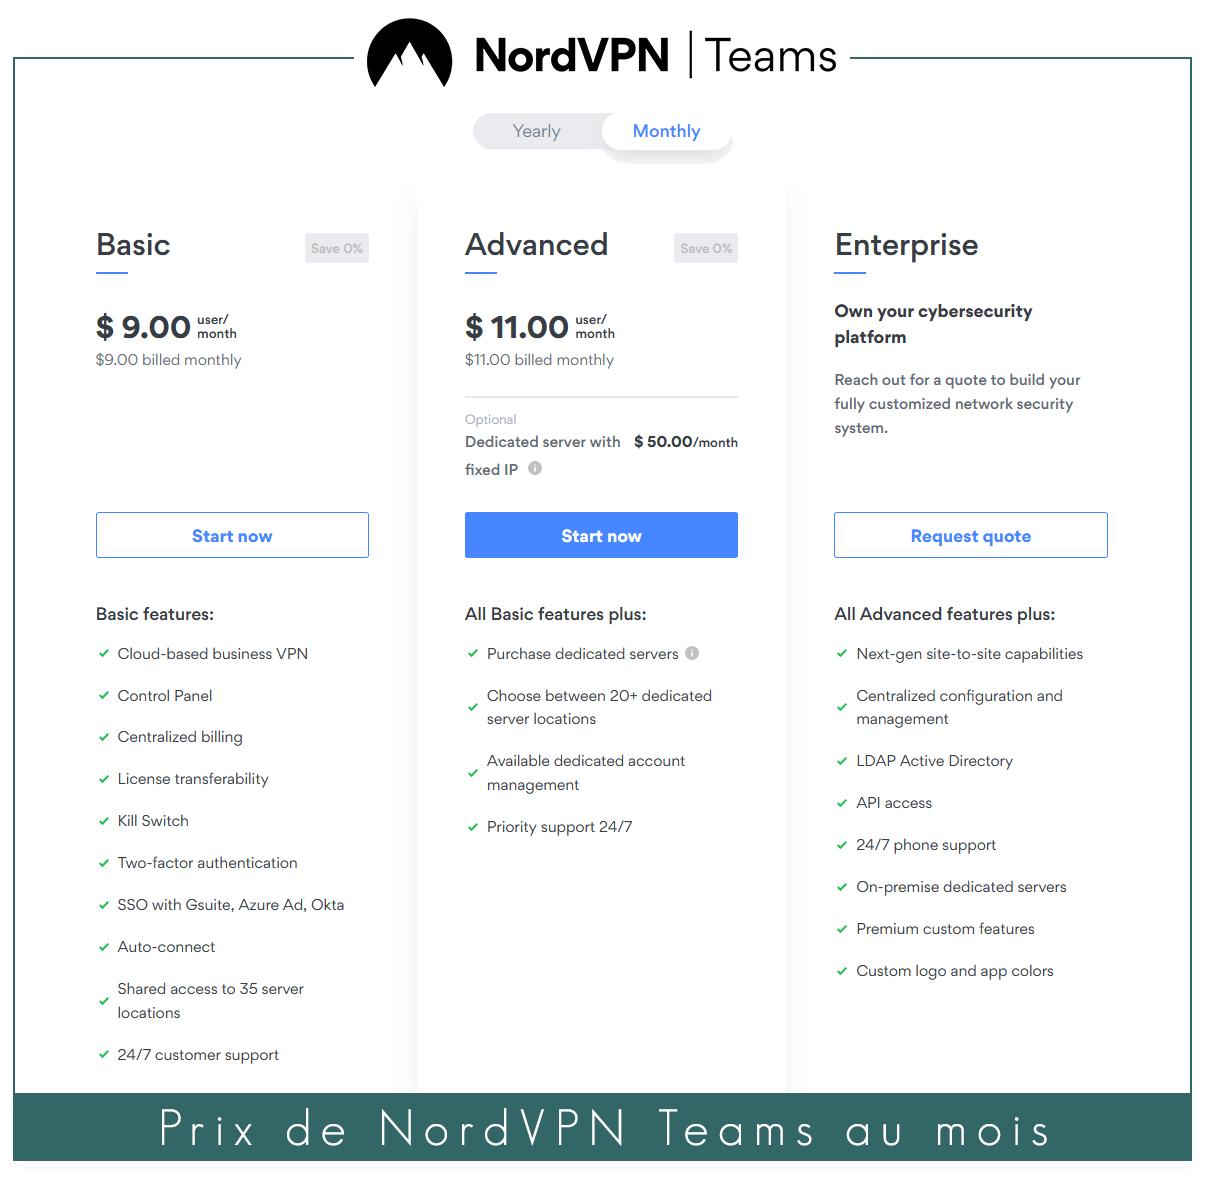 Illustration : prix de NordVPN Teams au mois